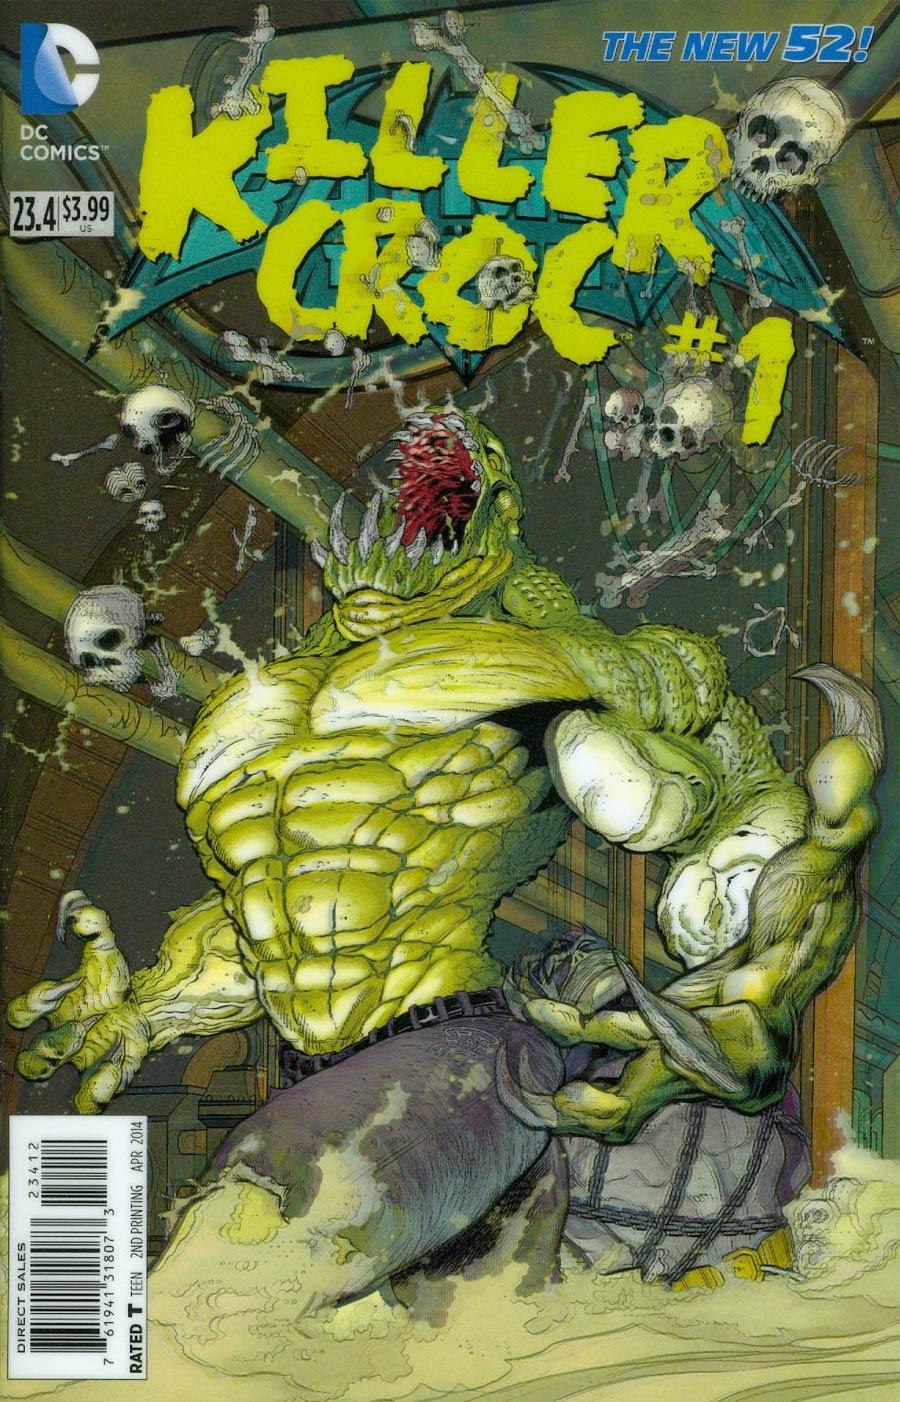 Batman And Robin Vol 2 #23.4 Killer Croc Cover C 2nd Ptg 3D Motion Cover